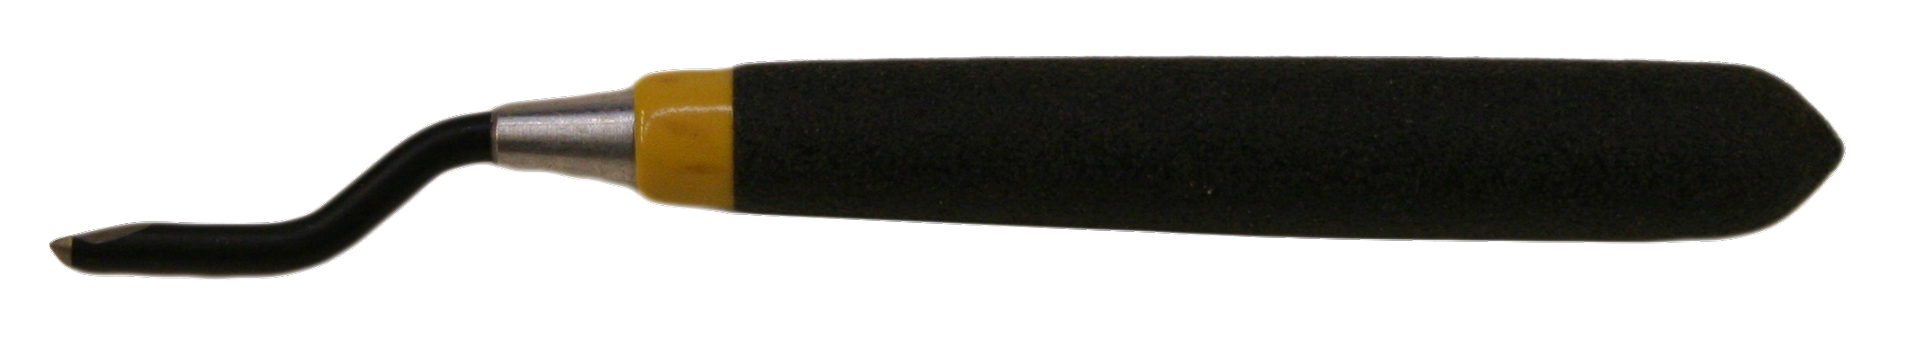 Micro SK KU <br/>FKU32, Ø 0,4 - 3 mm Image